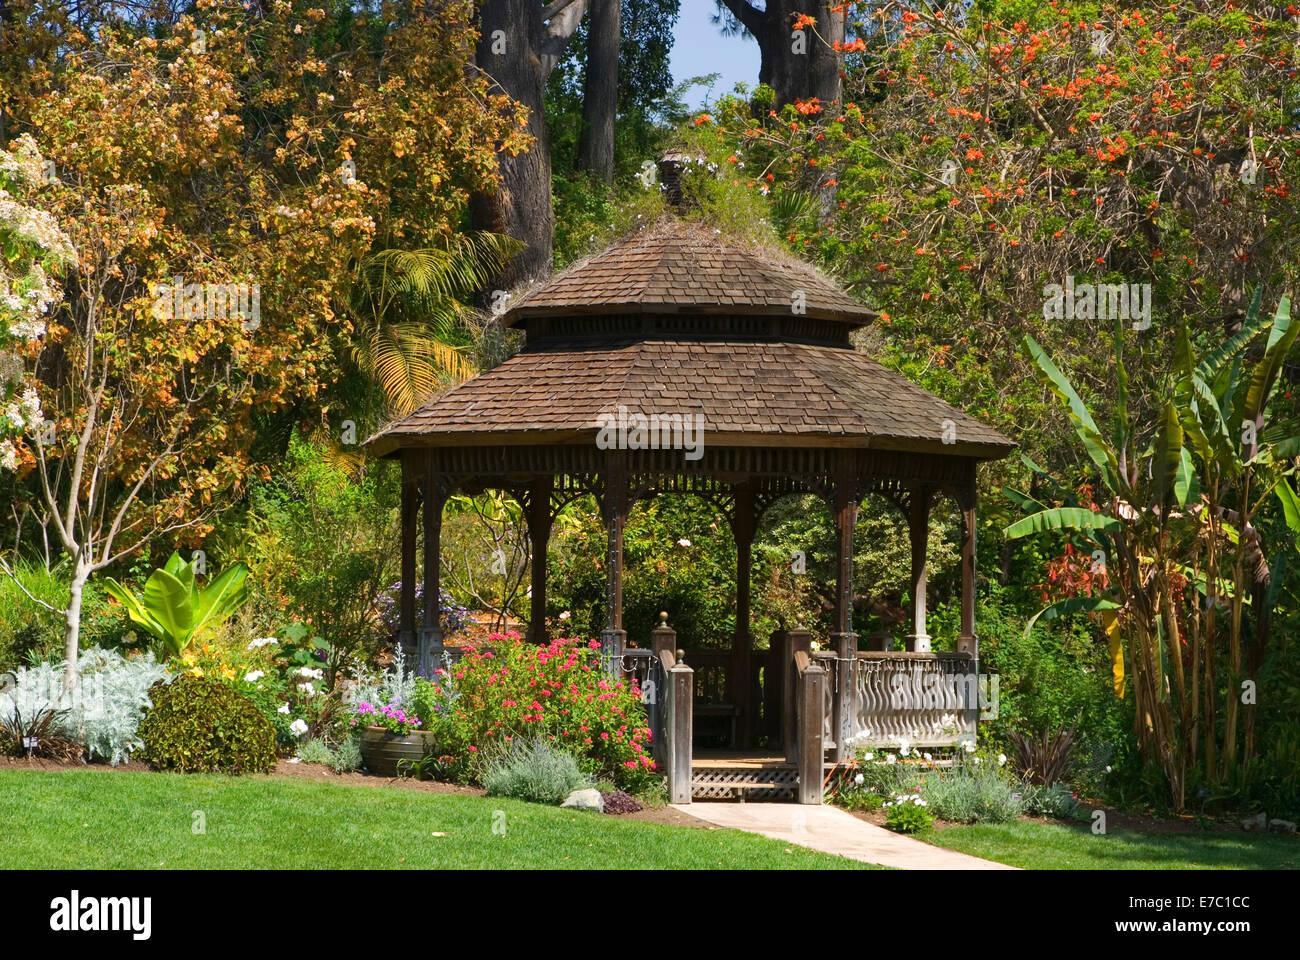 Gazebo, San Diego Botanic Garden, California